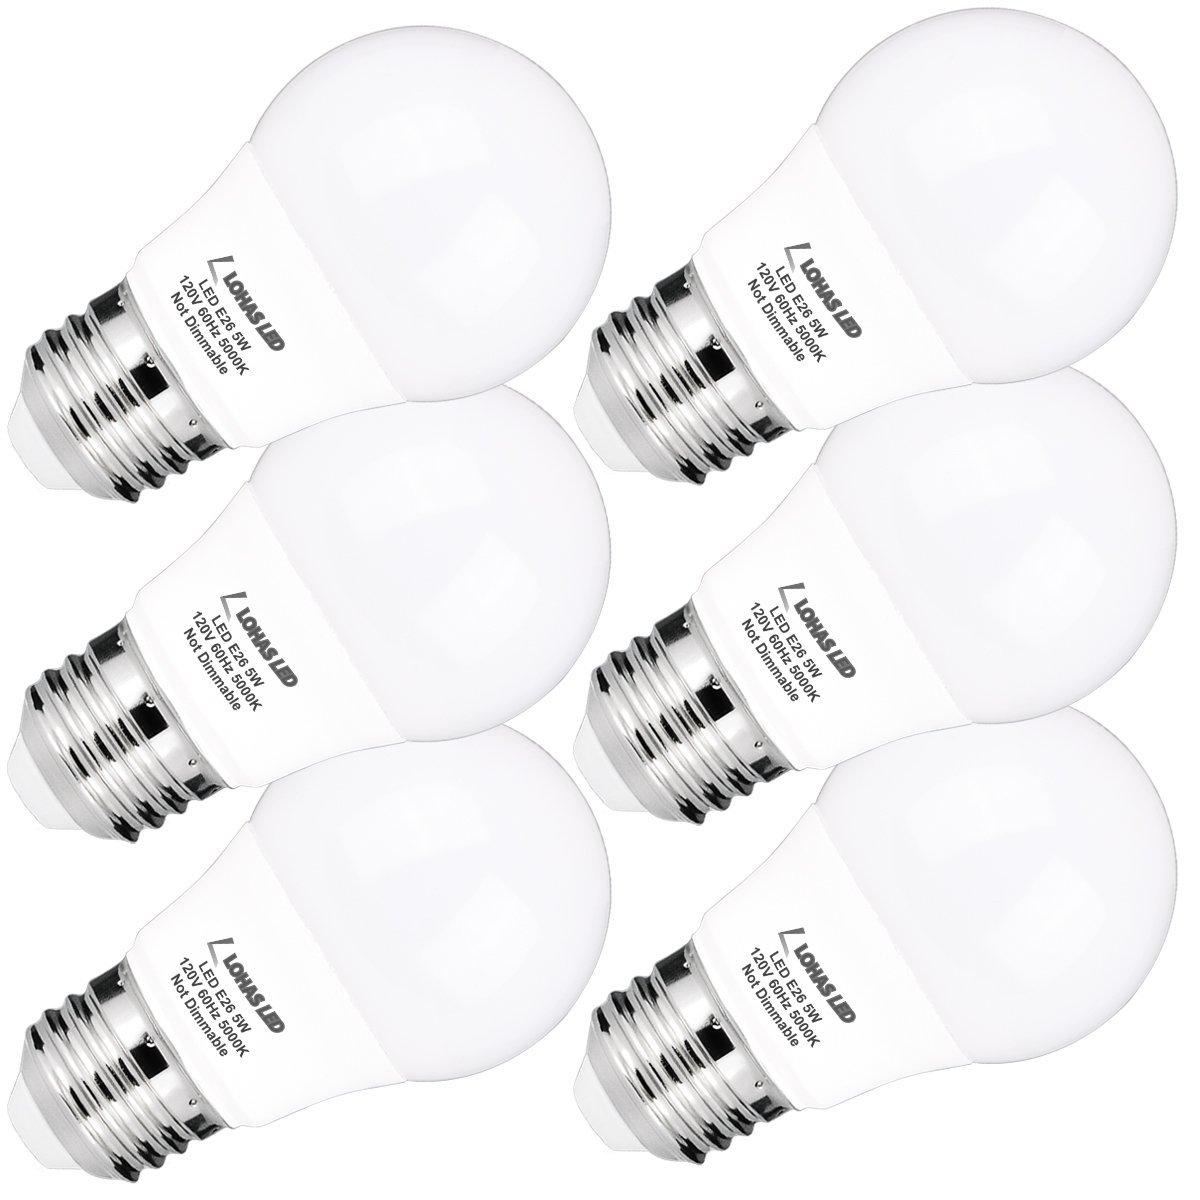 LOHAS LED Bulbs  A15 E26 5Watt Daylight 6-Pack + Free shipping @ Amazon $14.69